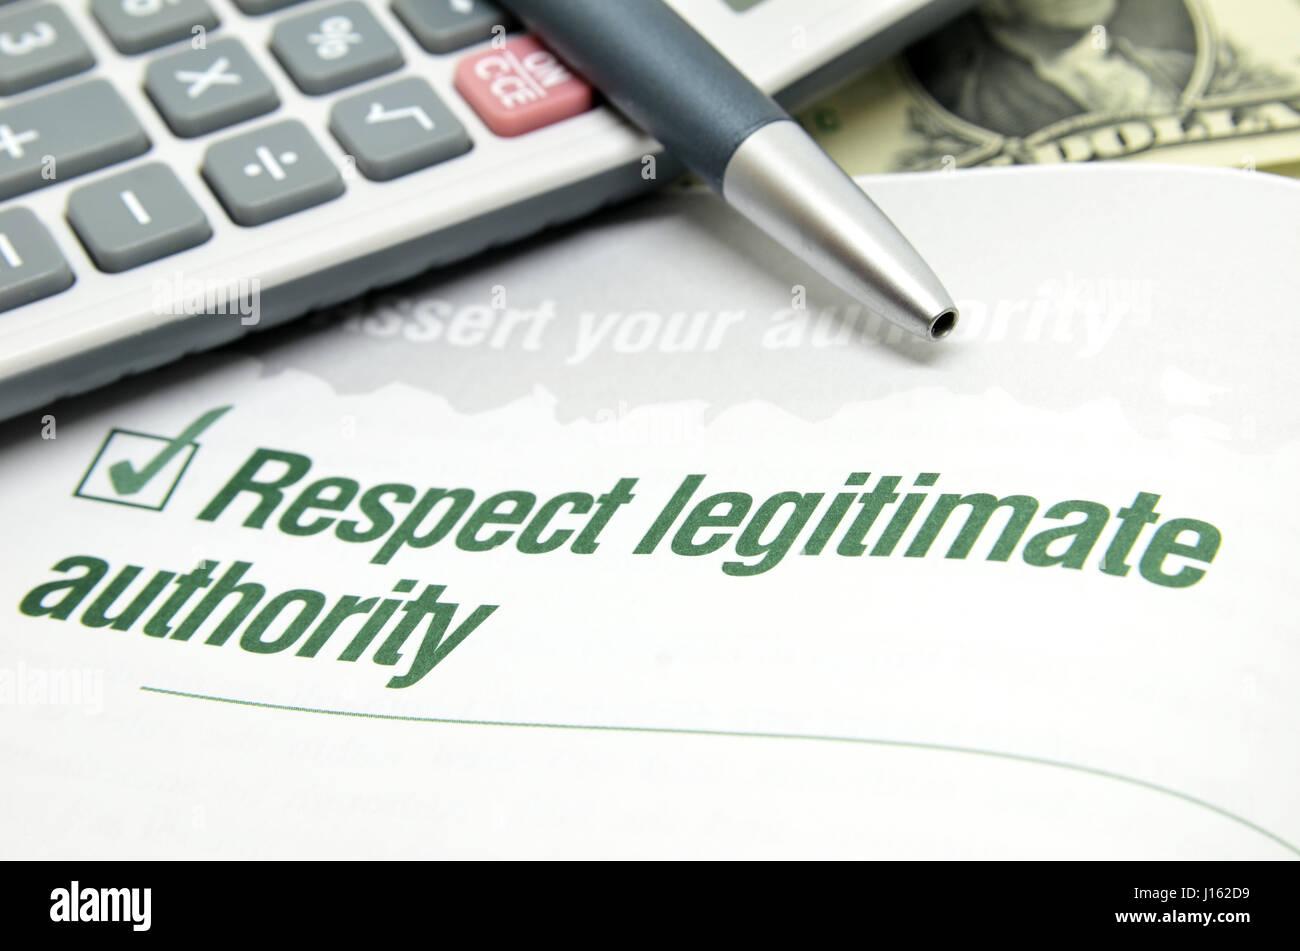 Respect legitimate authority printed on book - Stock Image